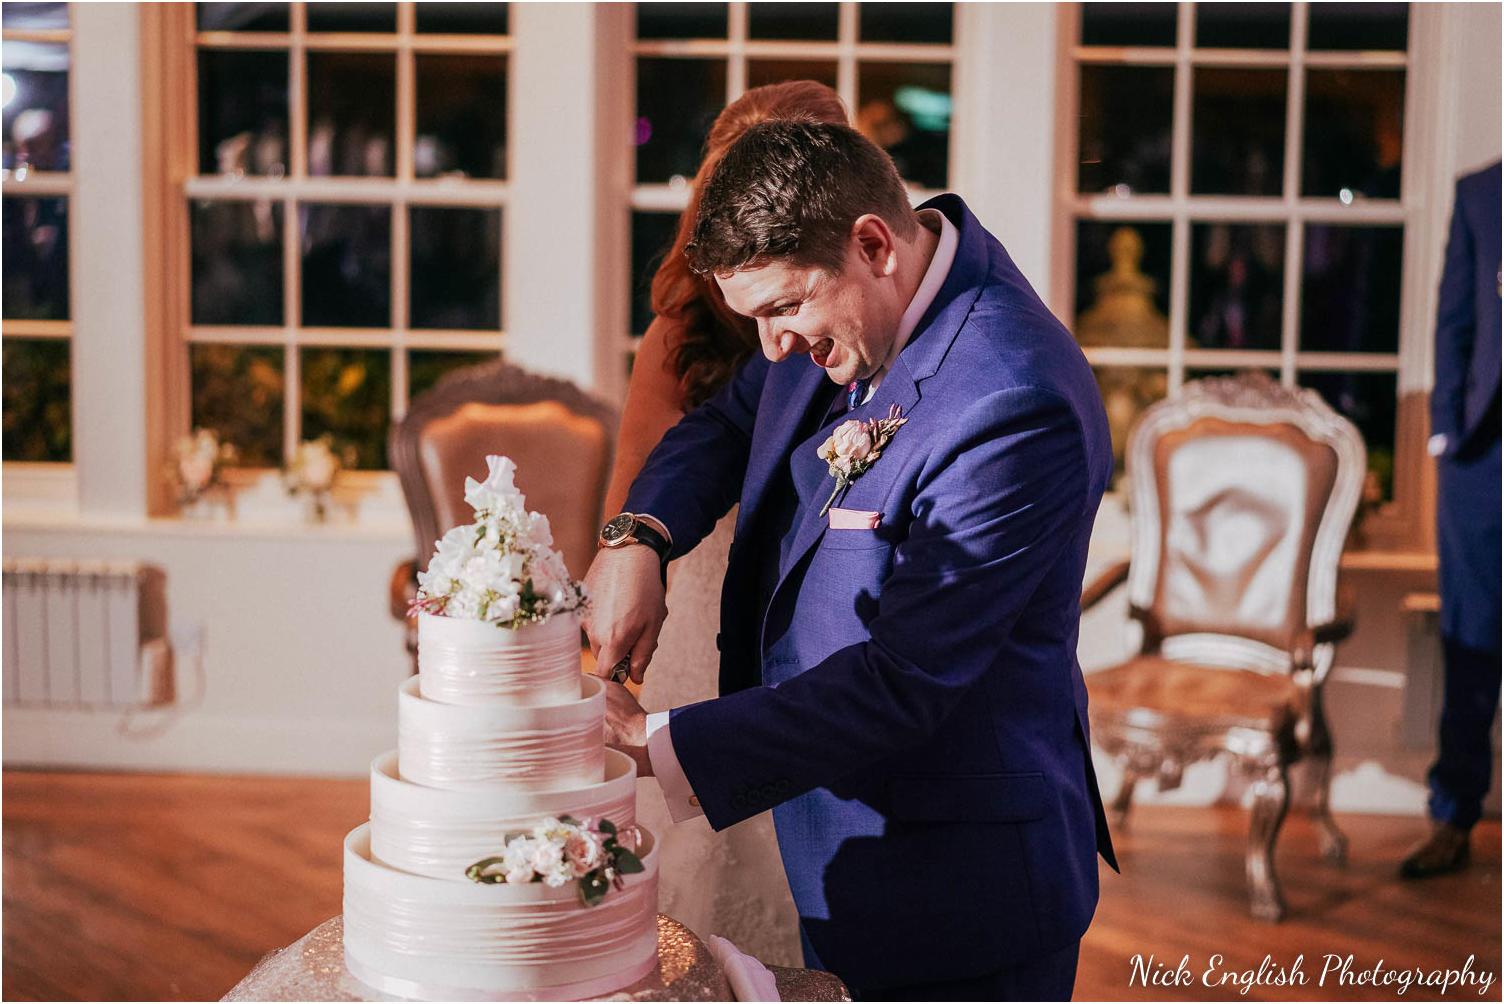 Mitton_Hall_Wedding_Photographer-197.jpg